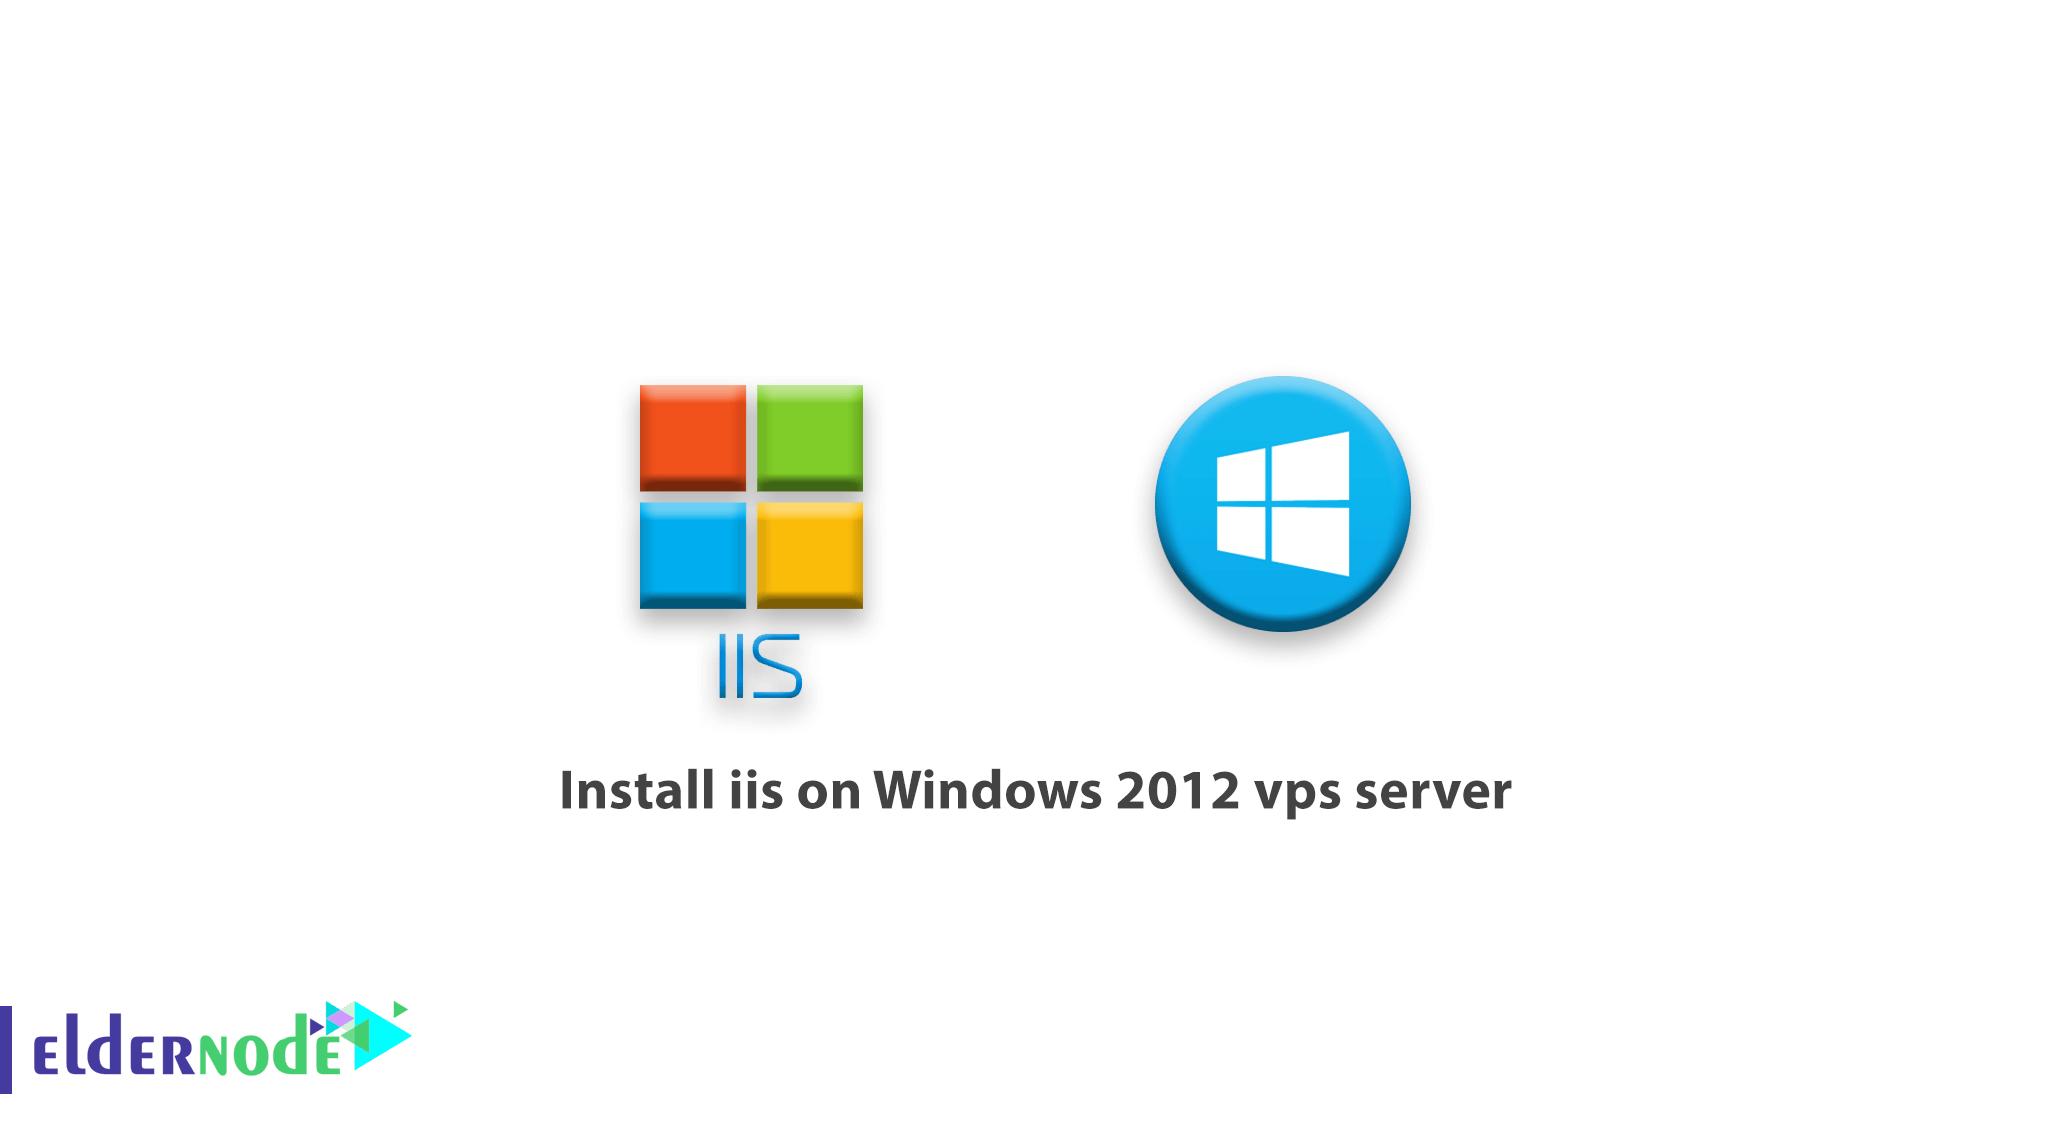 Install iis on Windows 2012 vps server